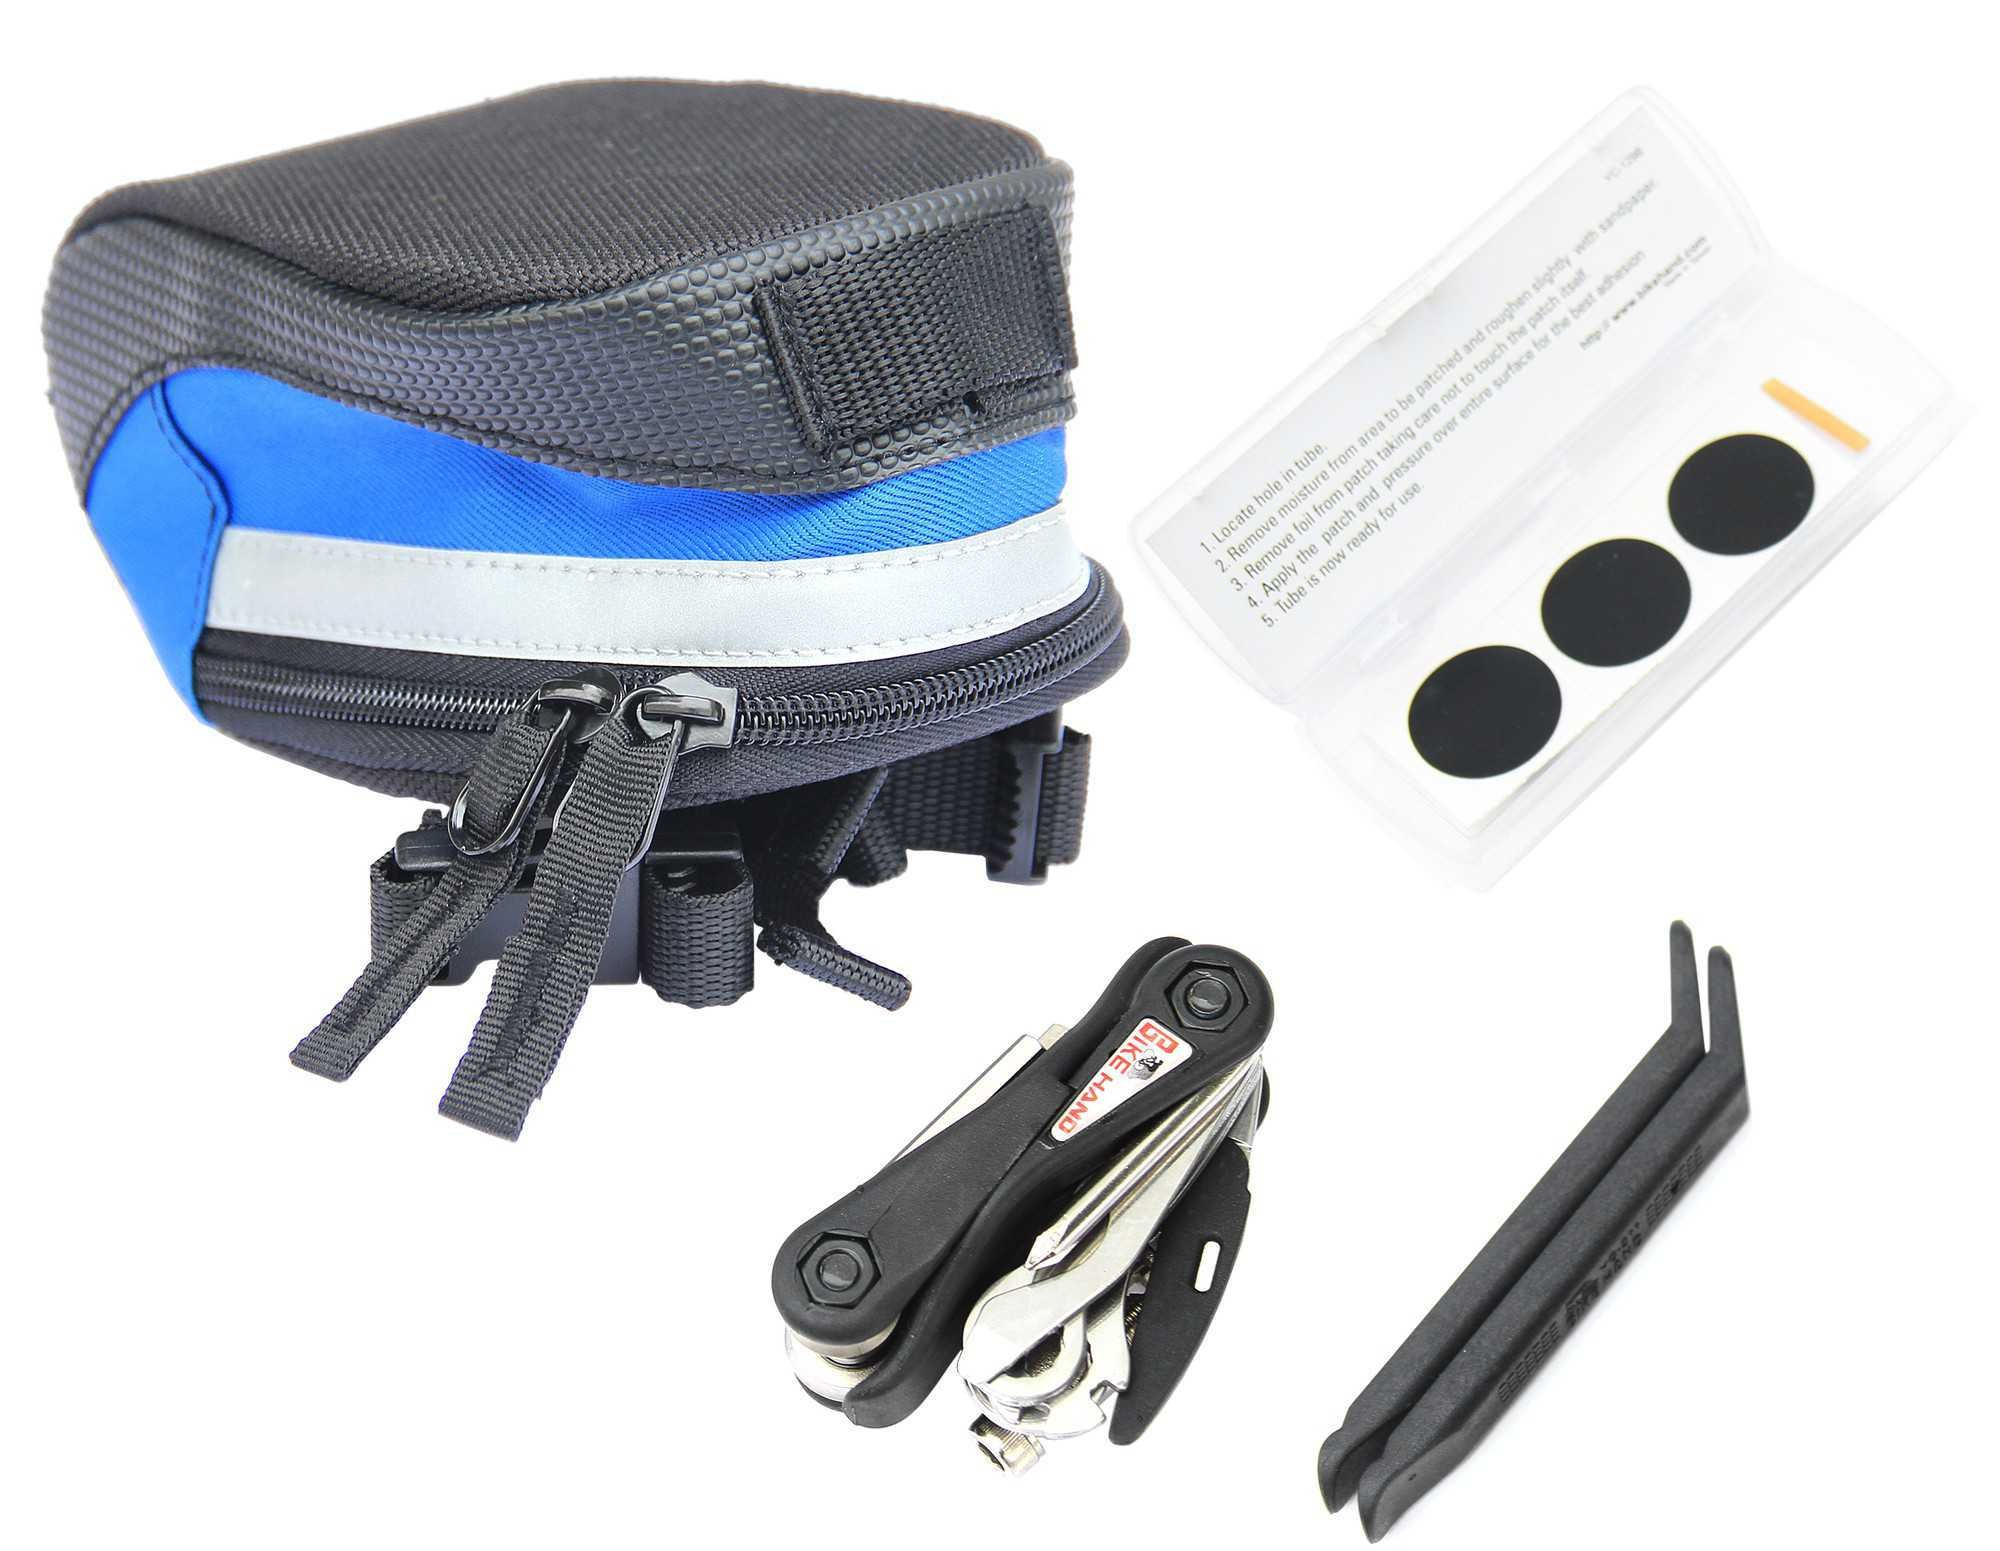 Bikehand Bike Bicycle Mini Folding Tool Kit with Saddle Bag